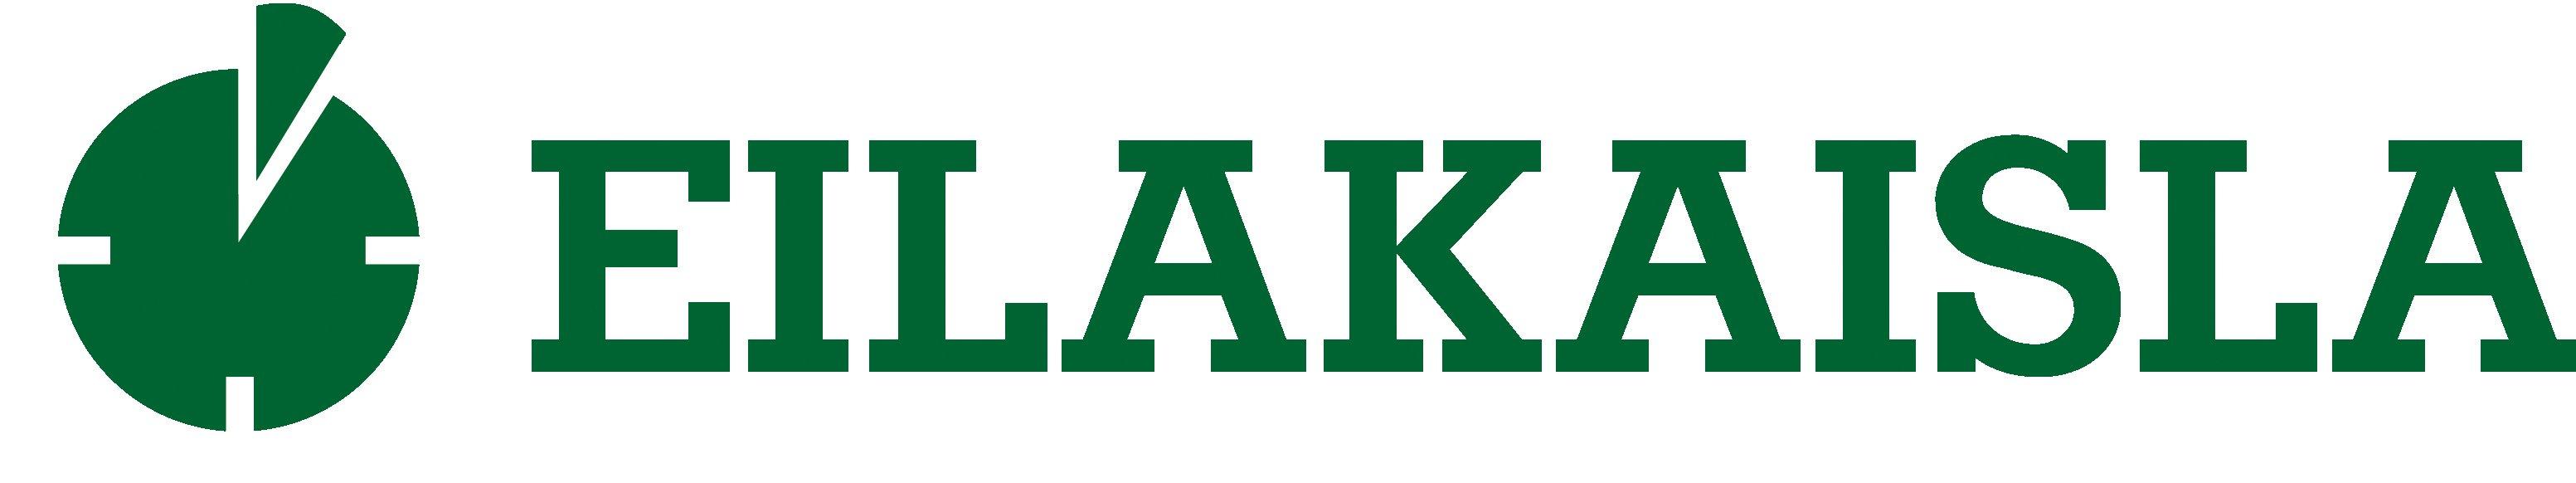 eilakaisla logo